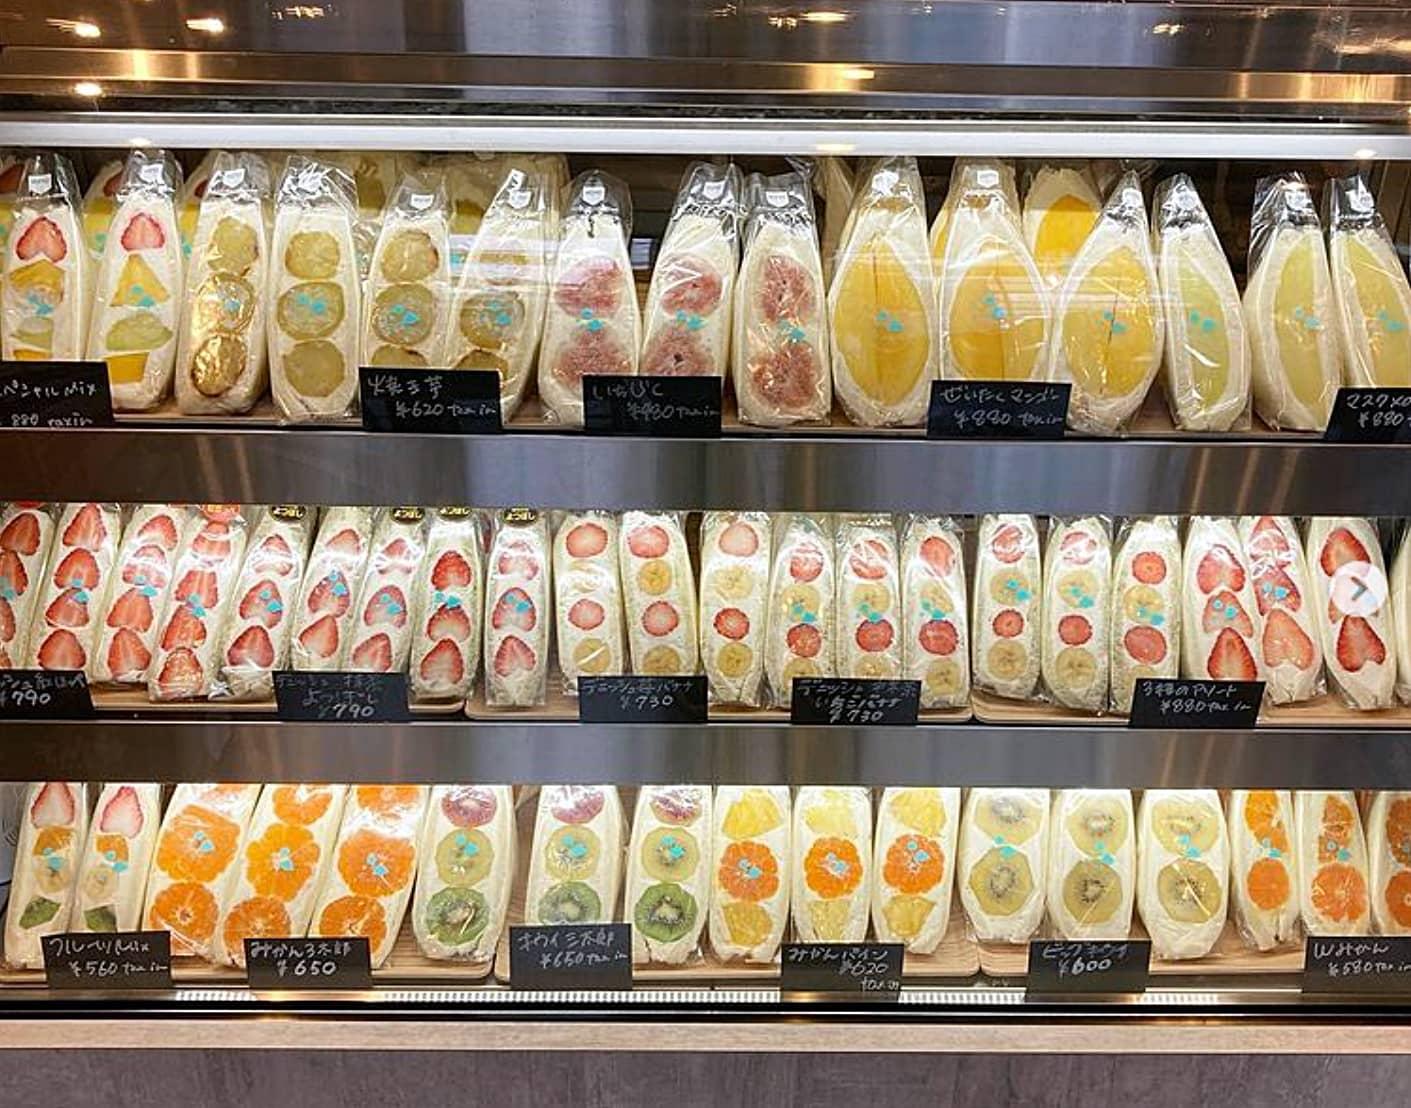 fufufu 渋谷店 フルーツサンド1